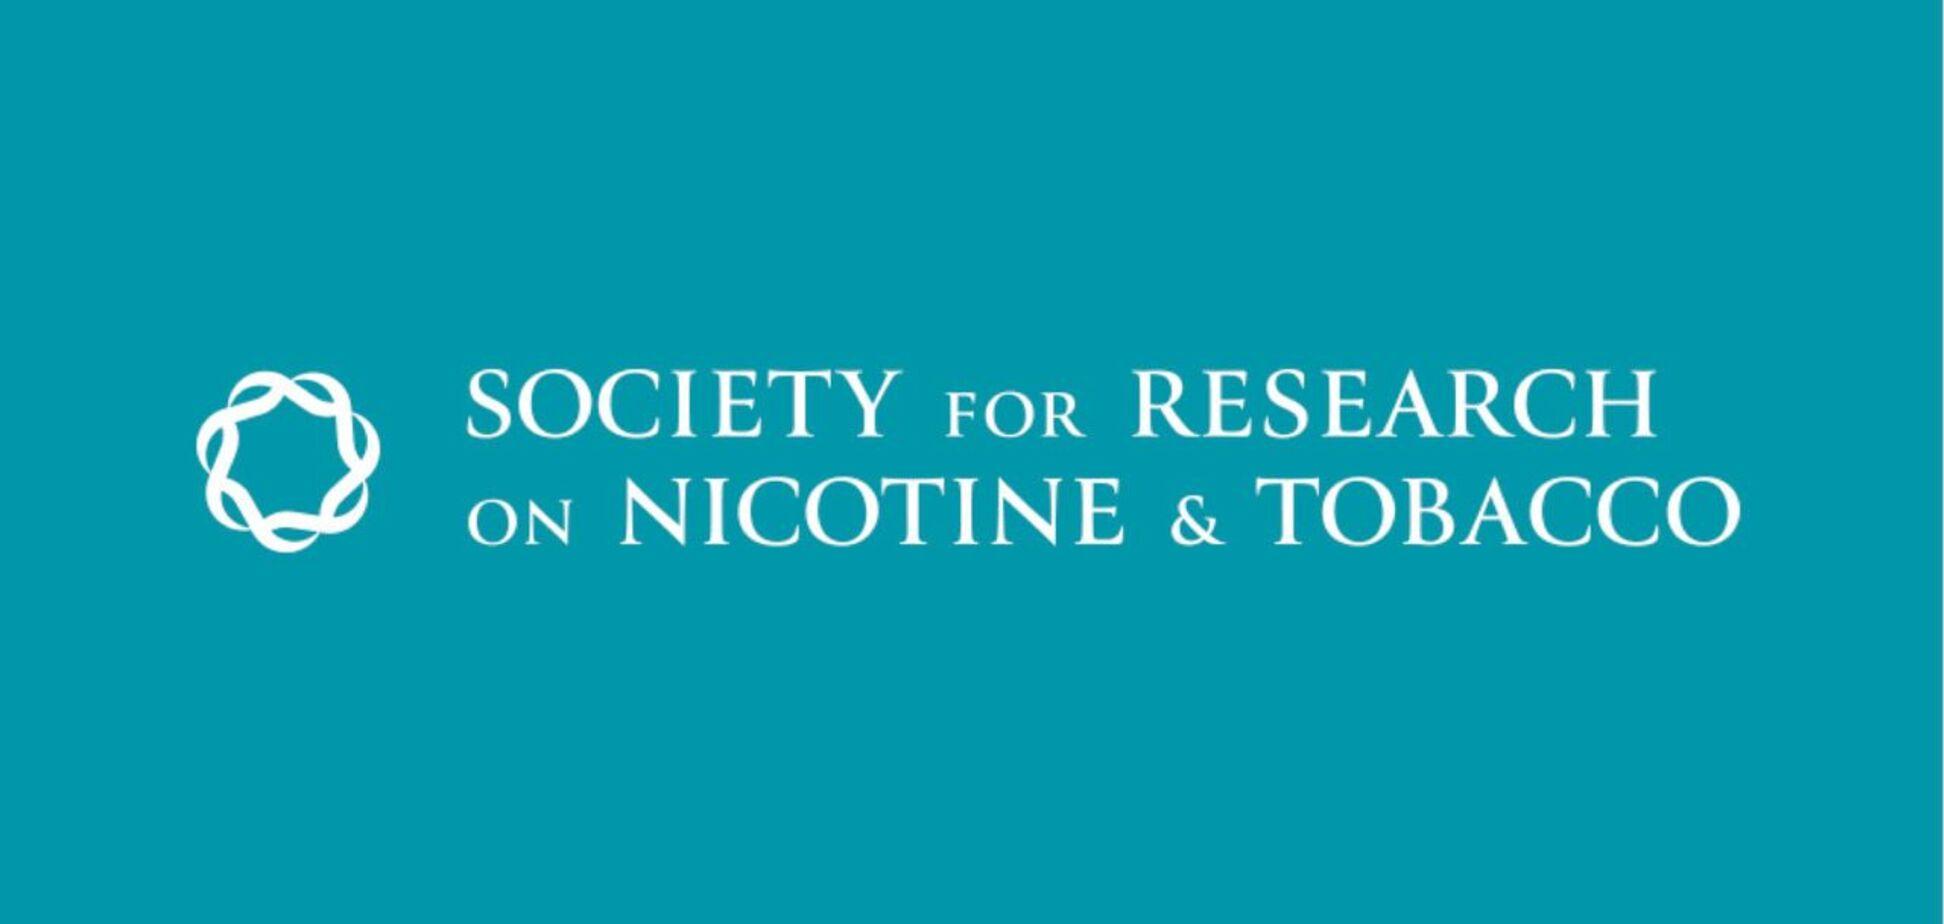 В феврале прошла конференция The Society for Research on Nicotine & Tobacco о влиянии курения на здоровье человека